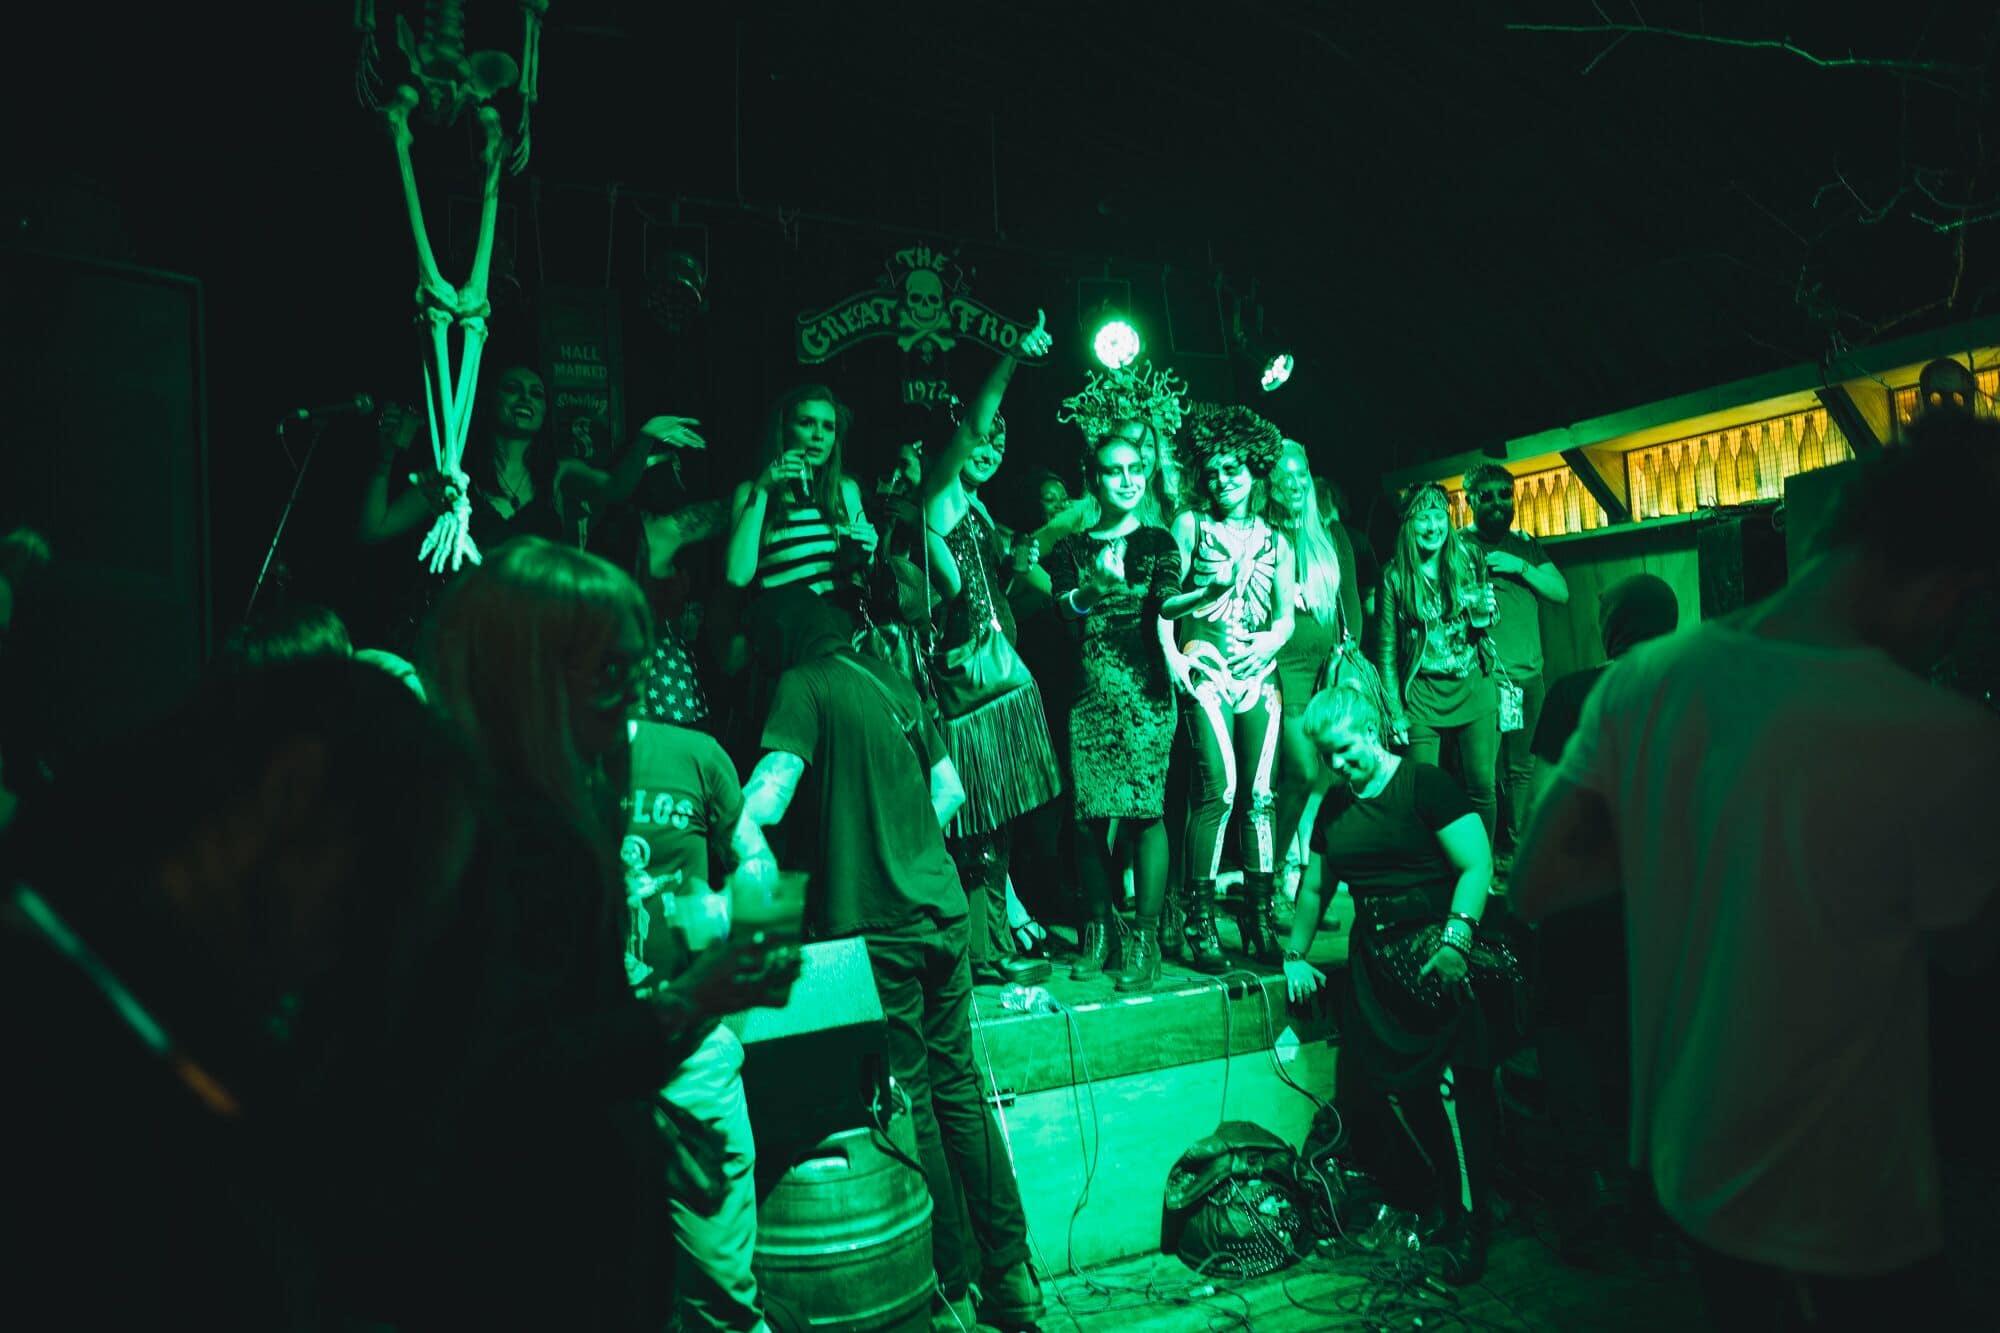 Halloween Photos feat. Frank Carter & The Rattlesnakes